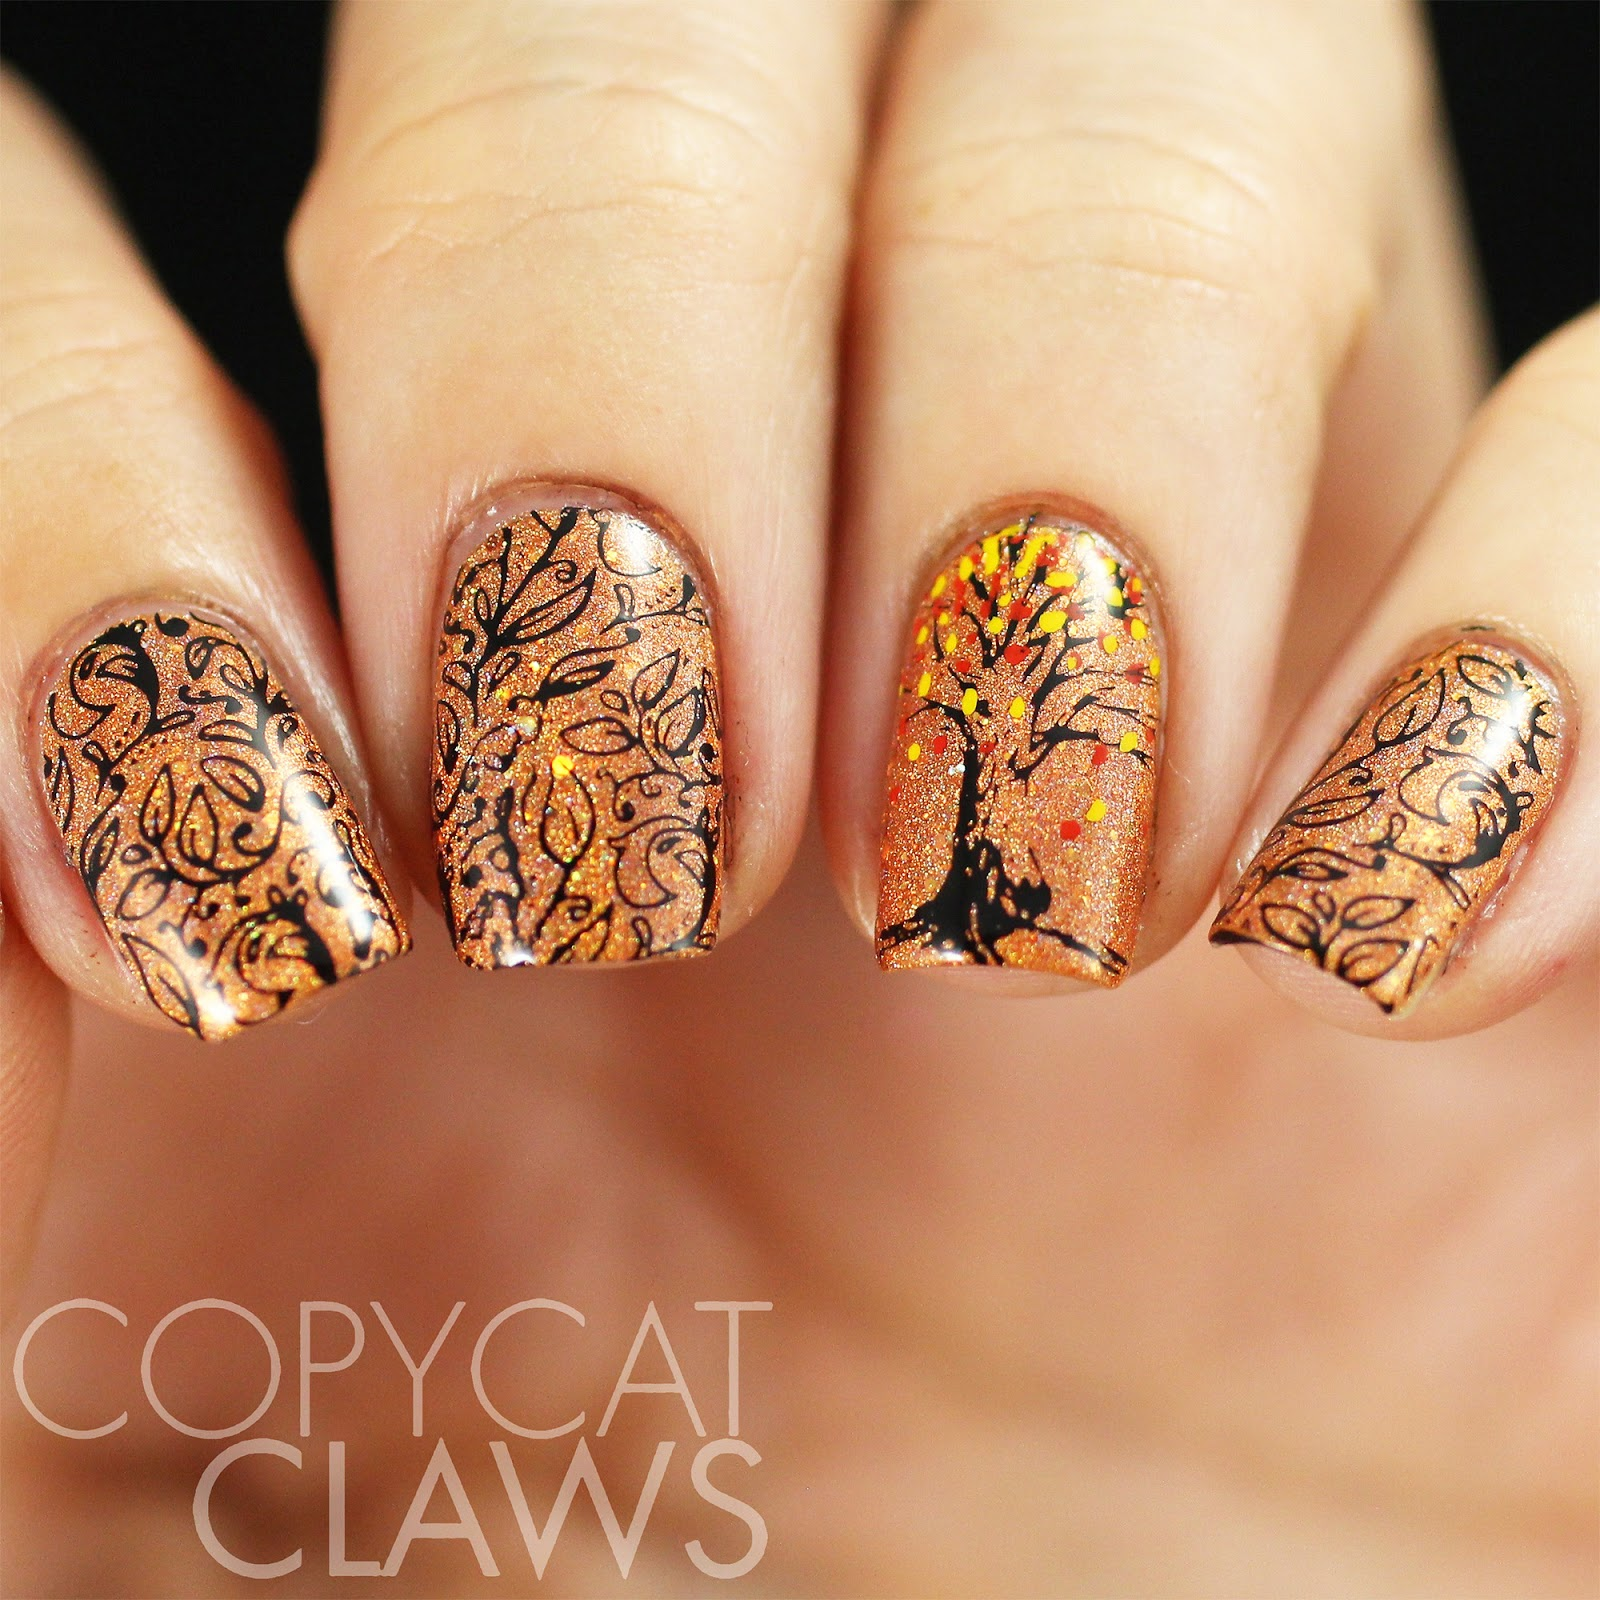 Copycat Claws: 40 Great Nail Art Ideas - Autumn